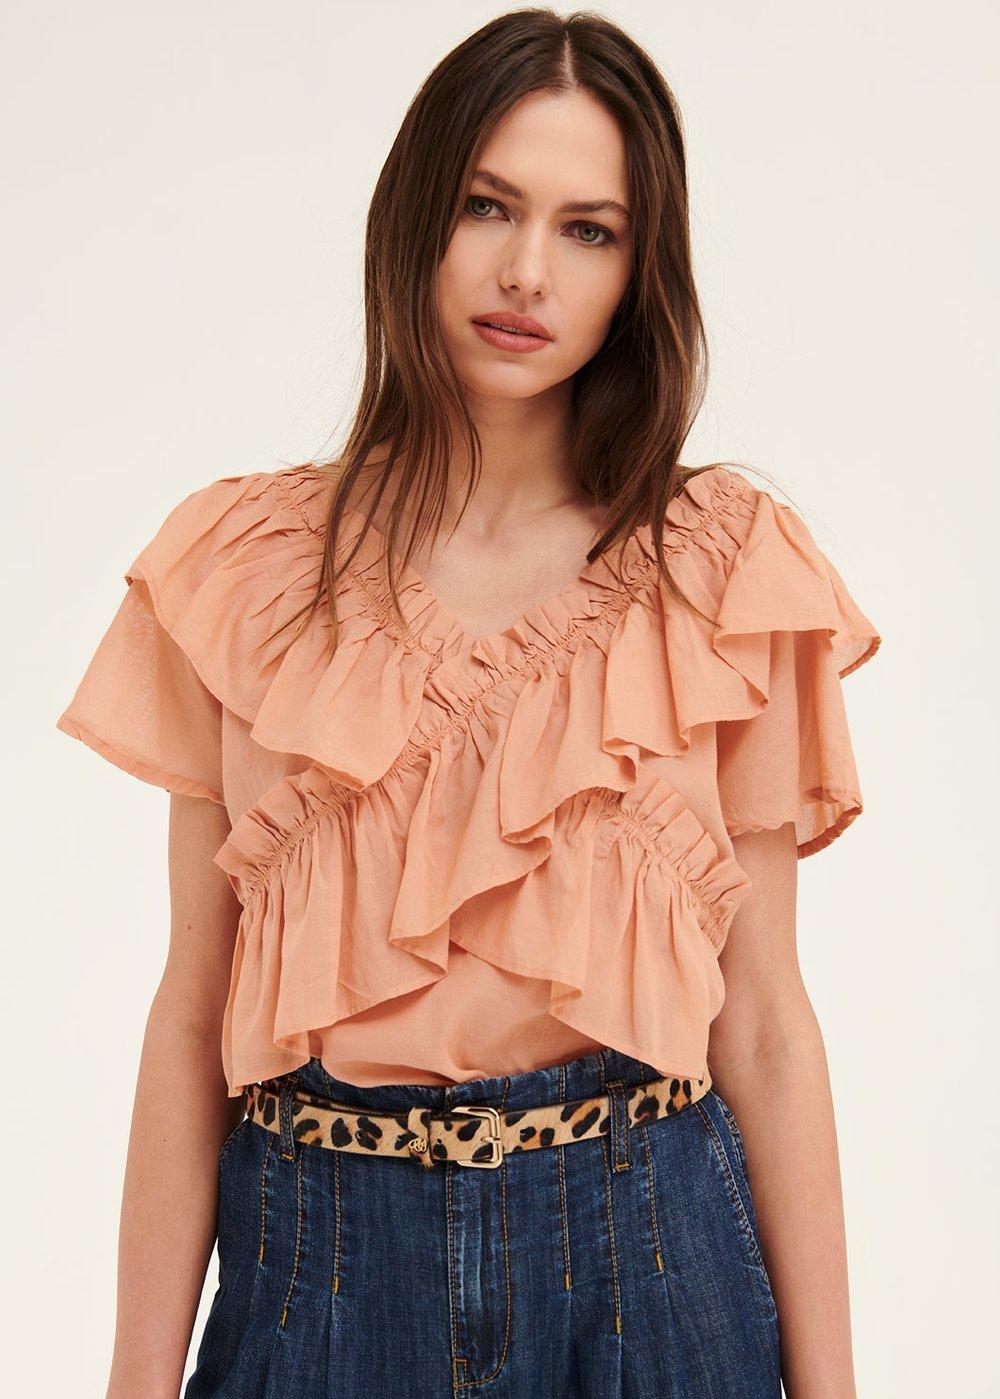 Tish blouse with ruffles - Salmon - Woman